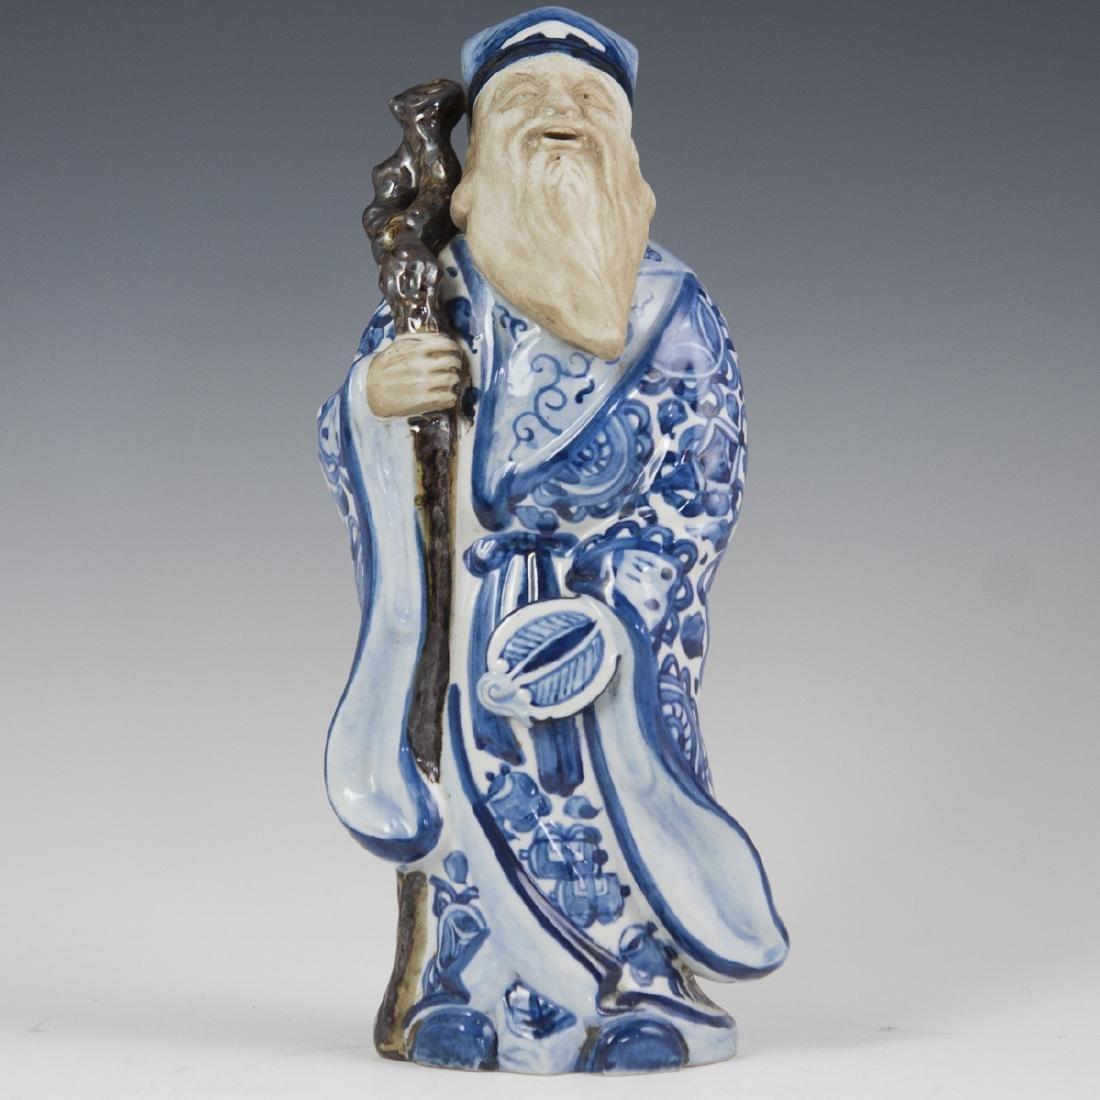 Chinese Glazed Pottery Shou Xing Figurine